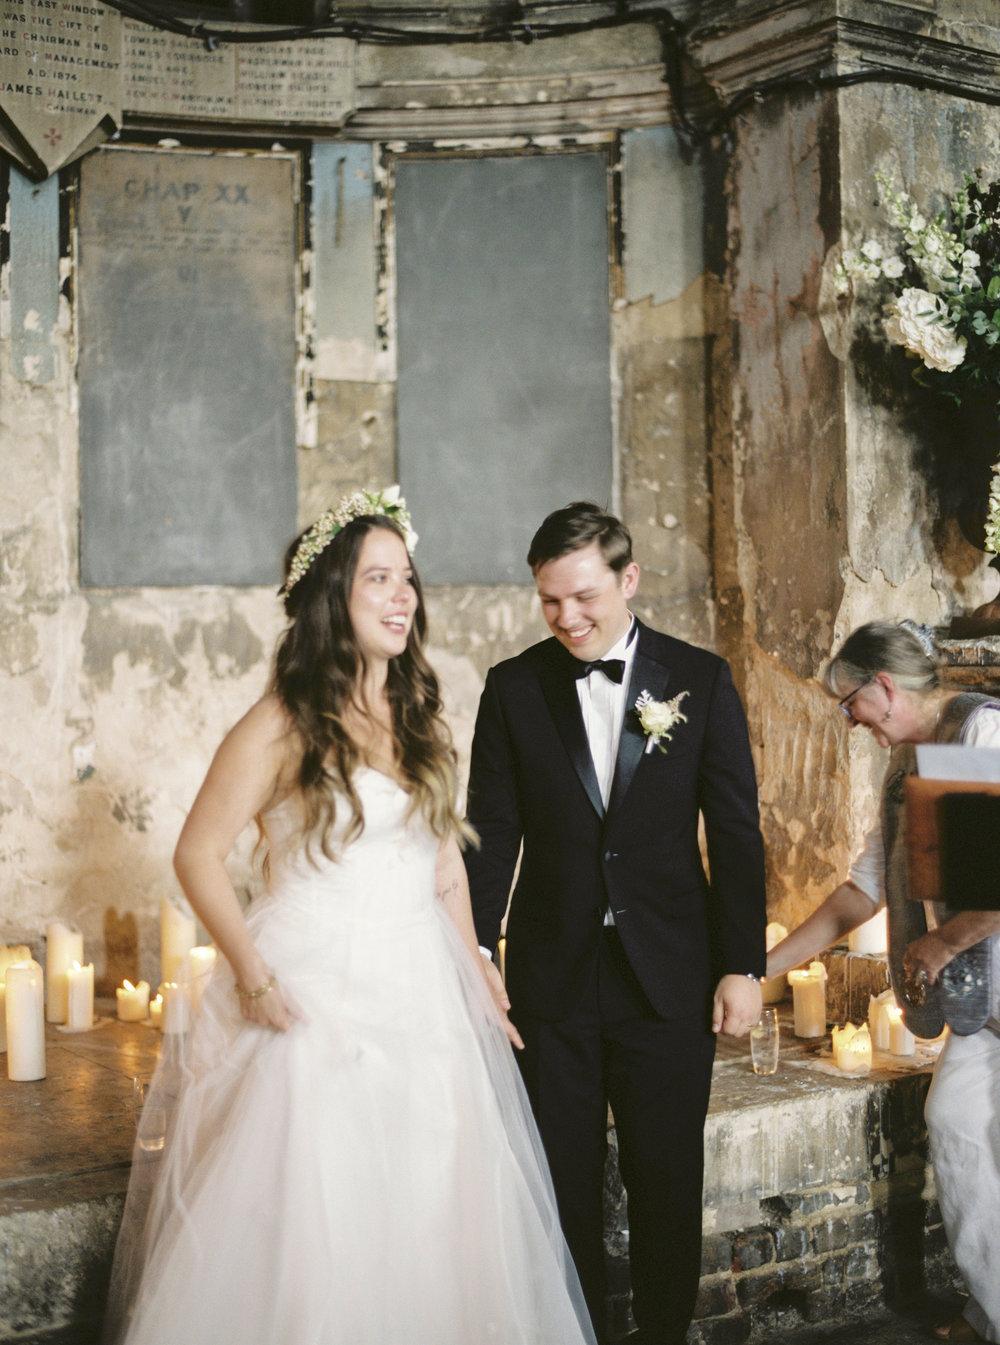 BM_Ayslum_Peakham_Wedding_ZosiaZachariaPhotography117.JPG